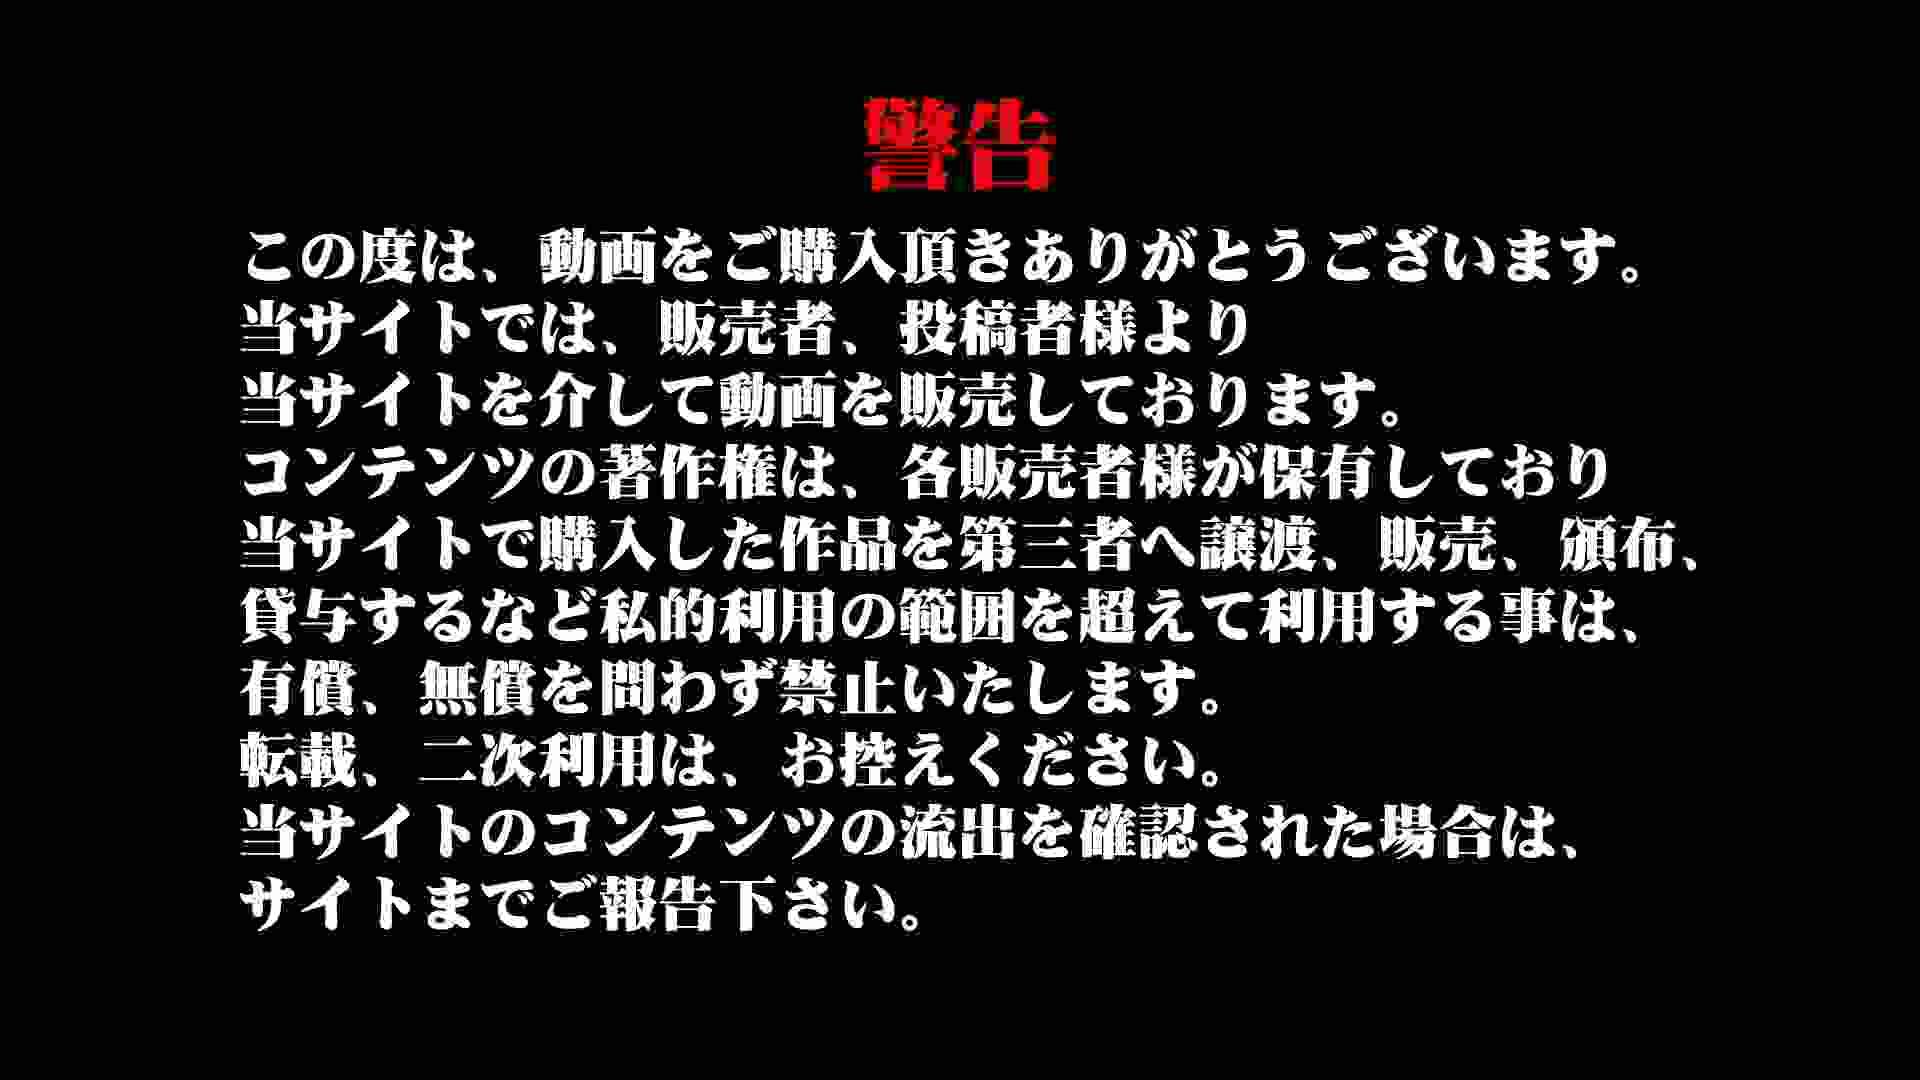 Aquaな露天風呂Vol.895 盗撮師作品  70pic 30